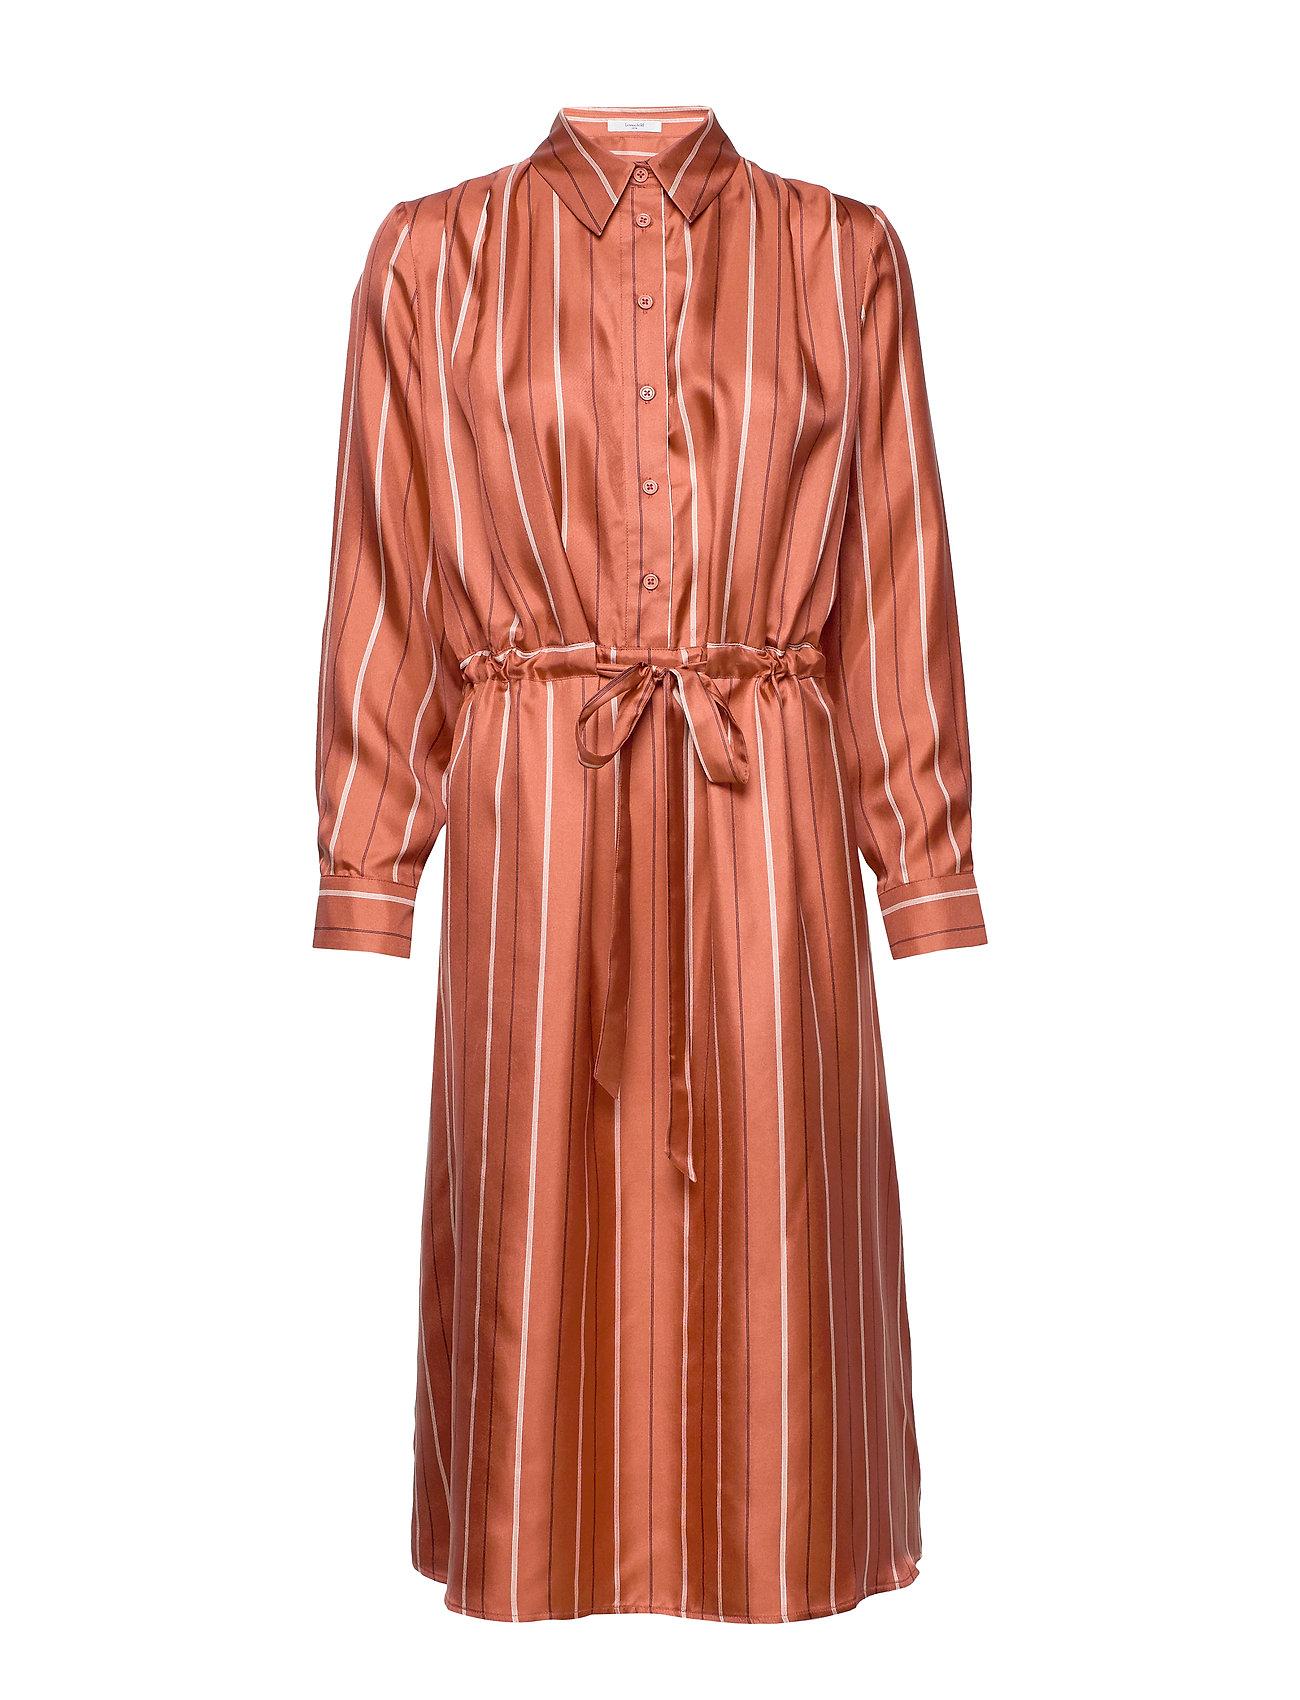 Frida Dress Knælang Kjole Orange Lovechild 1979